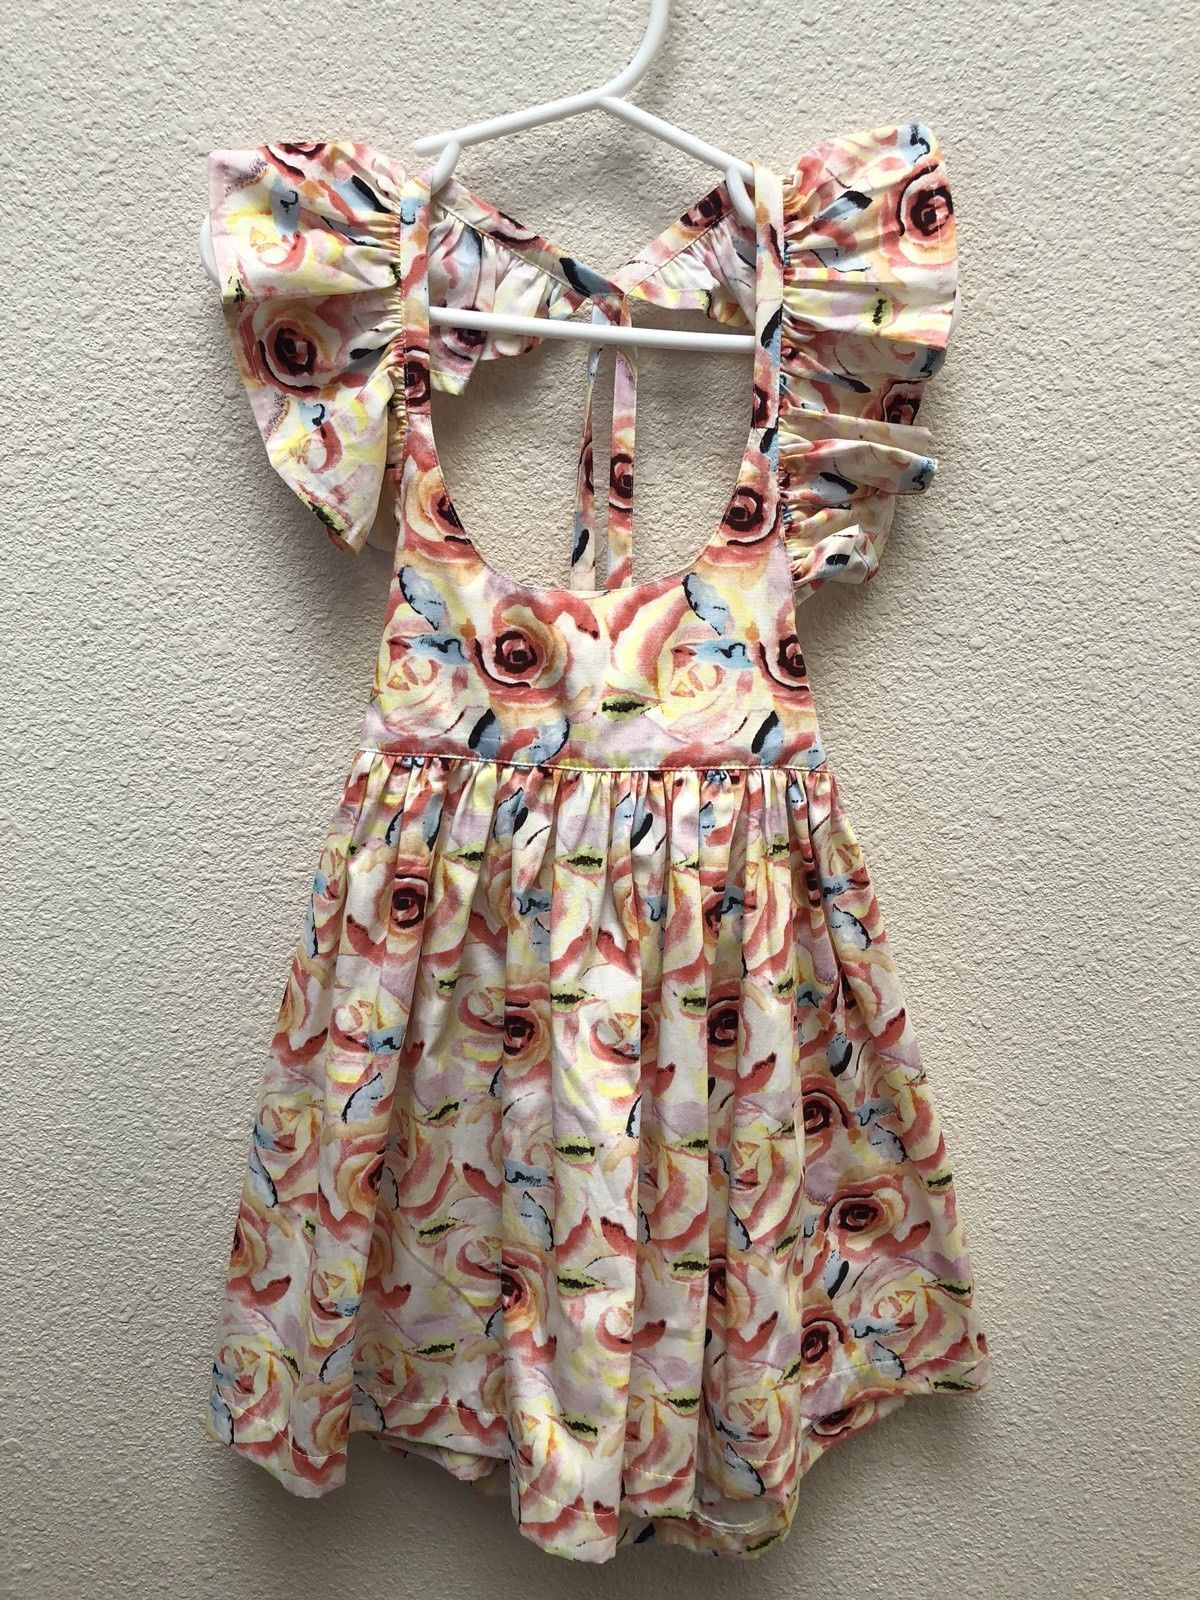 0481c34a8 Girls Boutique Lacey Lane Australia MIA DRESS SIZE 3 NWT